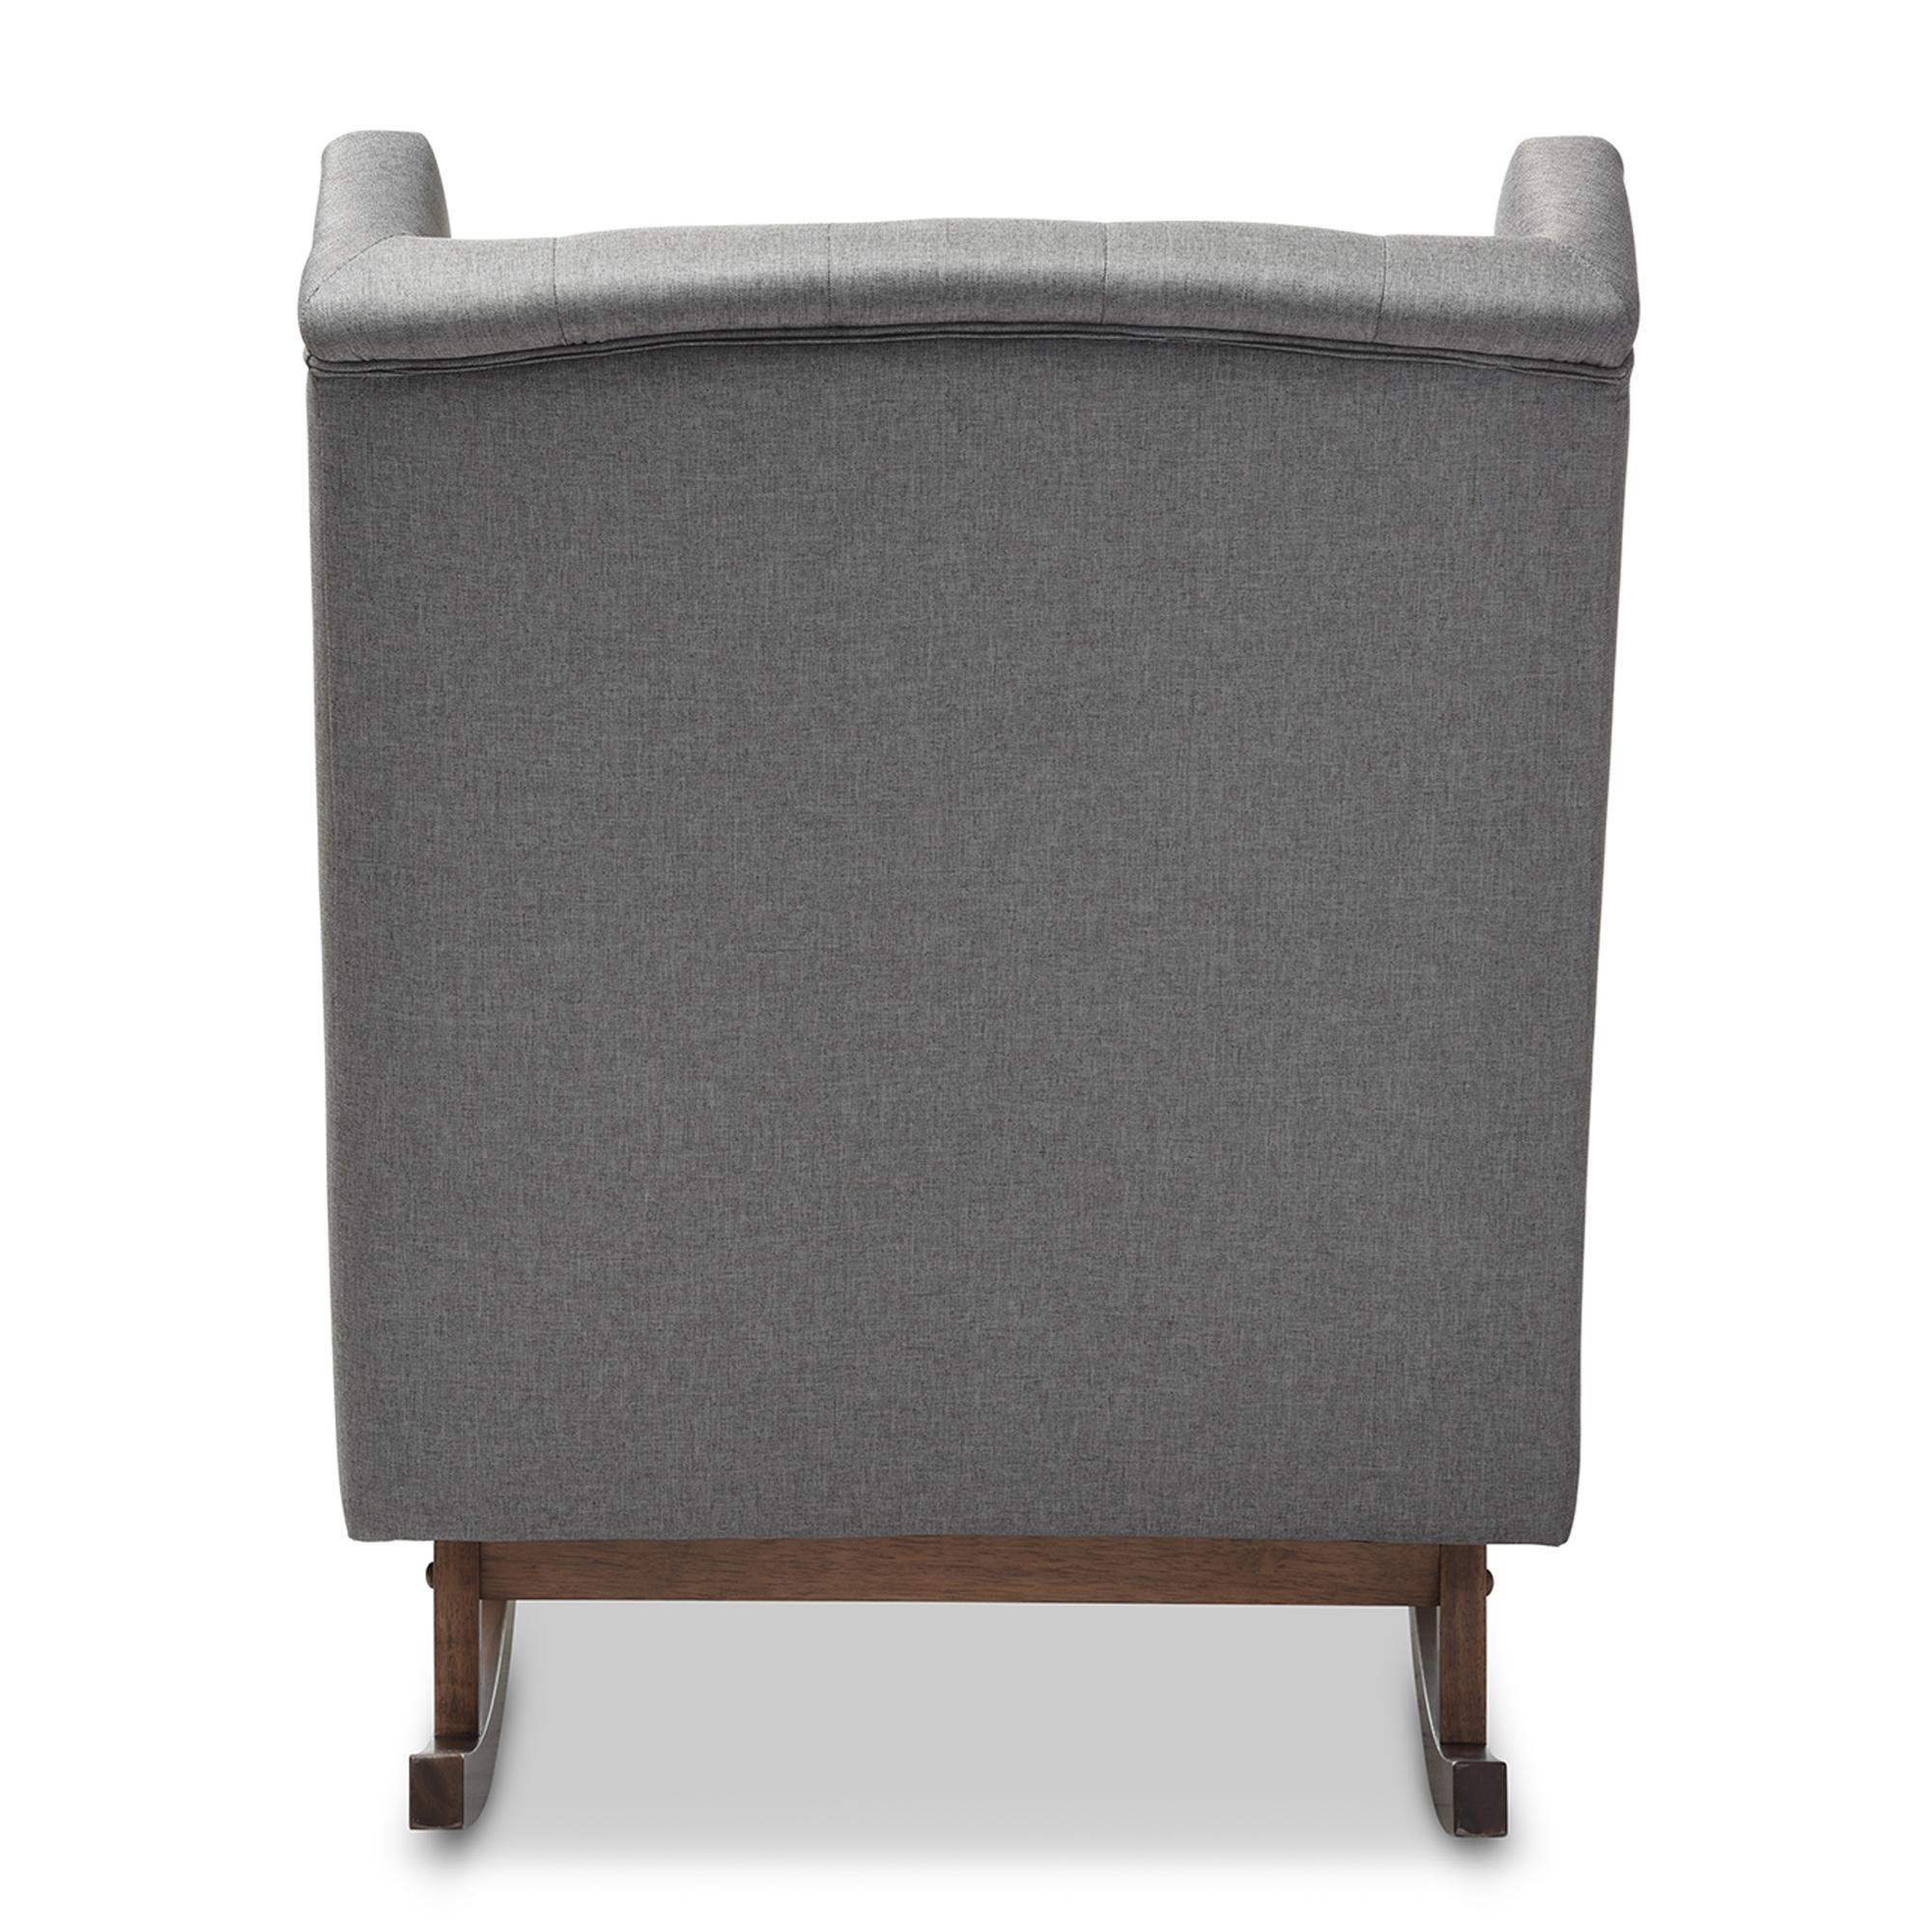 baxton studio iona mid century retro modern. Baxton Studio Iona Mid-century Retro Modern Grey Fabric Upholstered Button-tufted Wingback Rocking Mid Century S